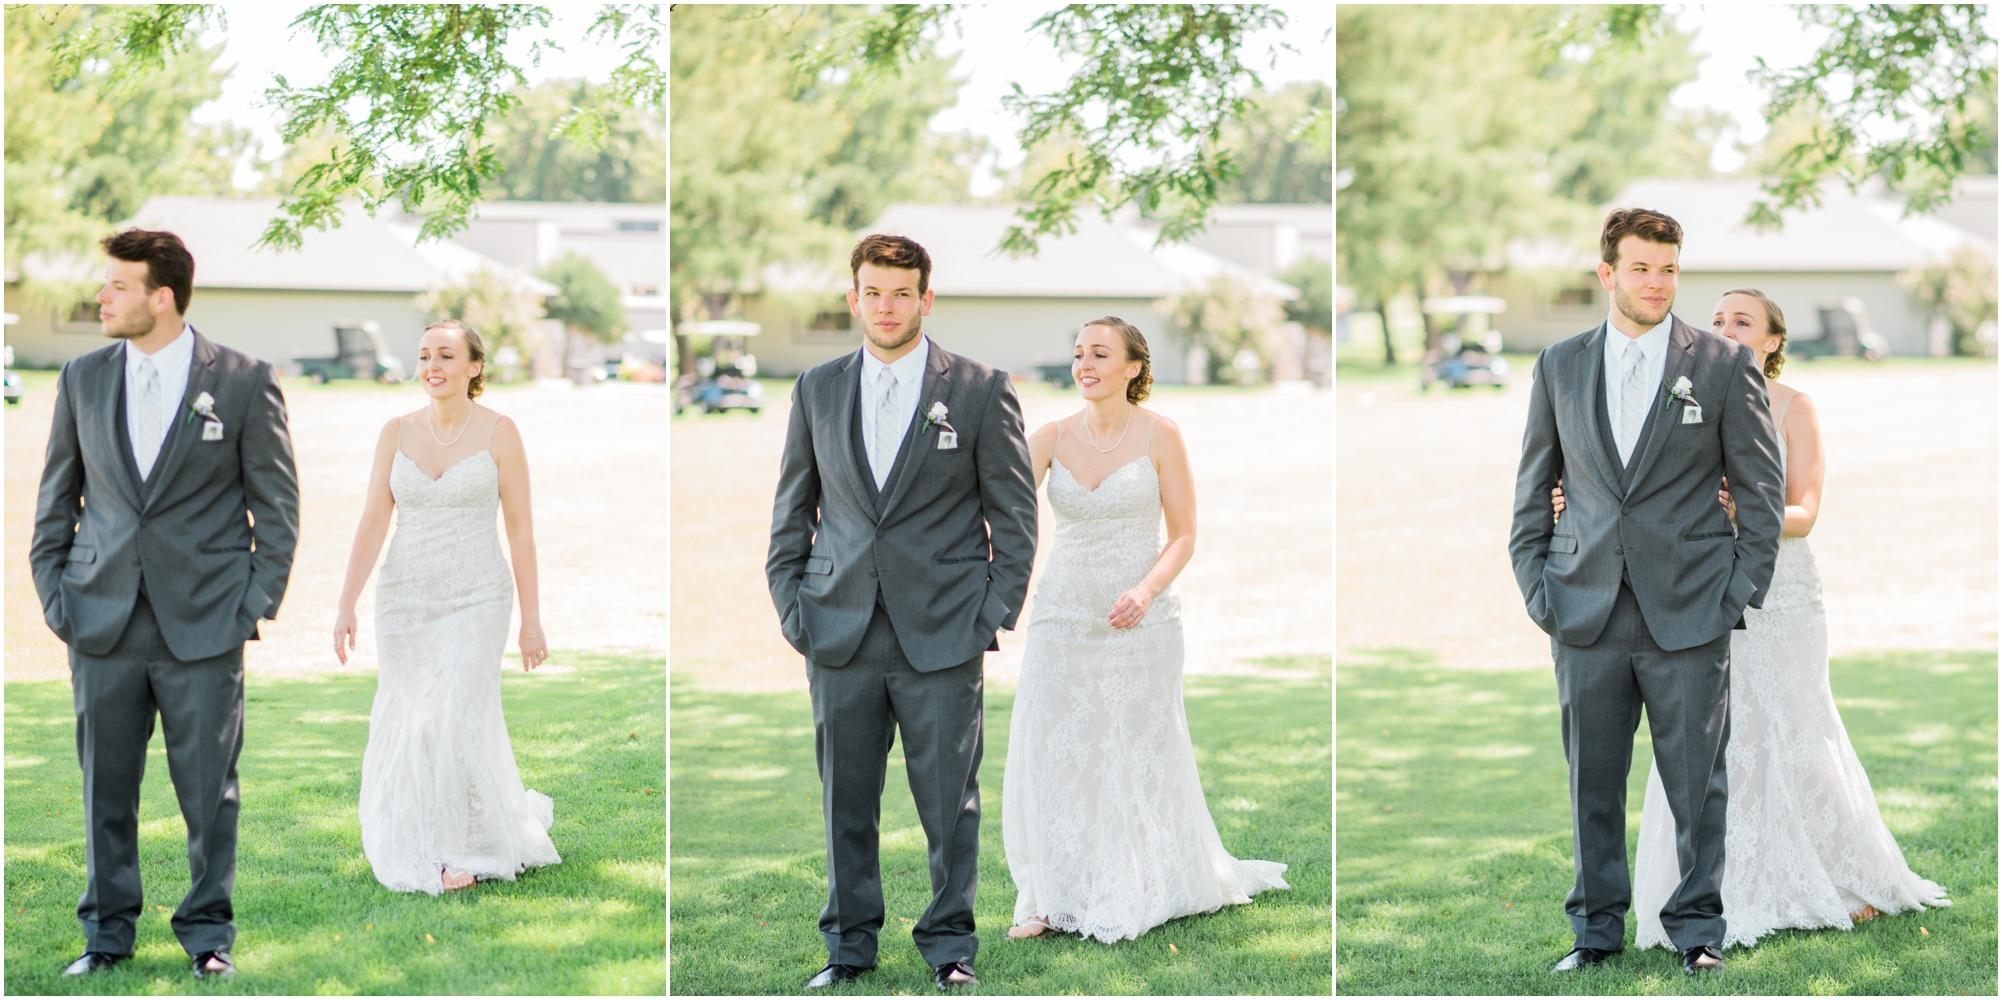 Wisconsin-Wedding-Photographer-Reedsburg-Country-Club-Kaela-and Matt-Wedding-30.jpg